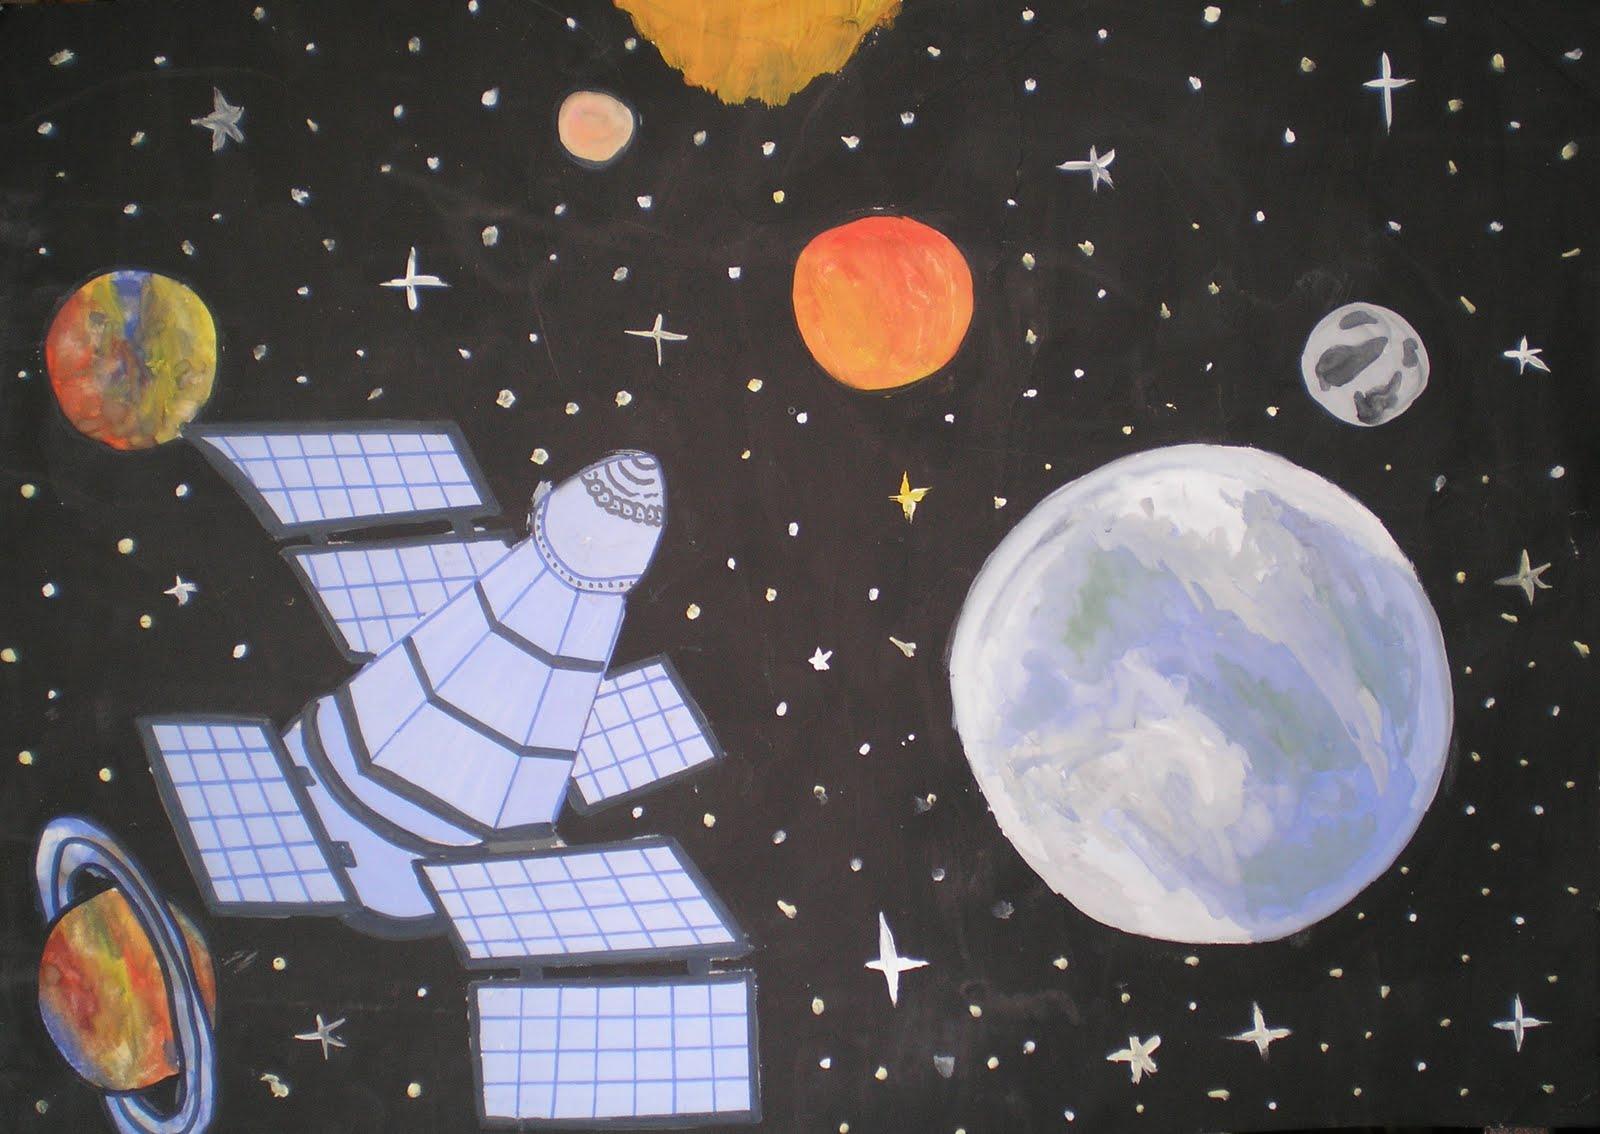 Рисунки о космосе 7 фотография